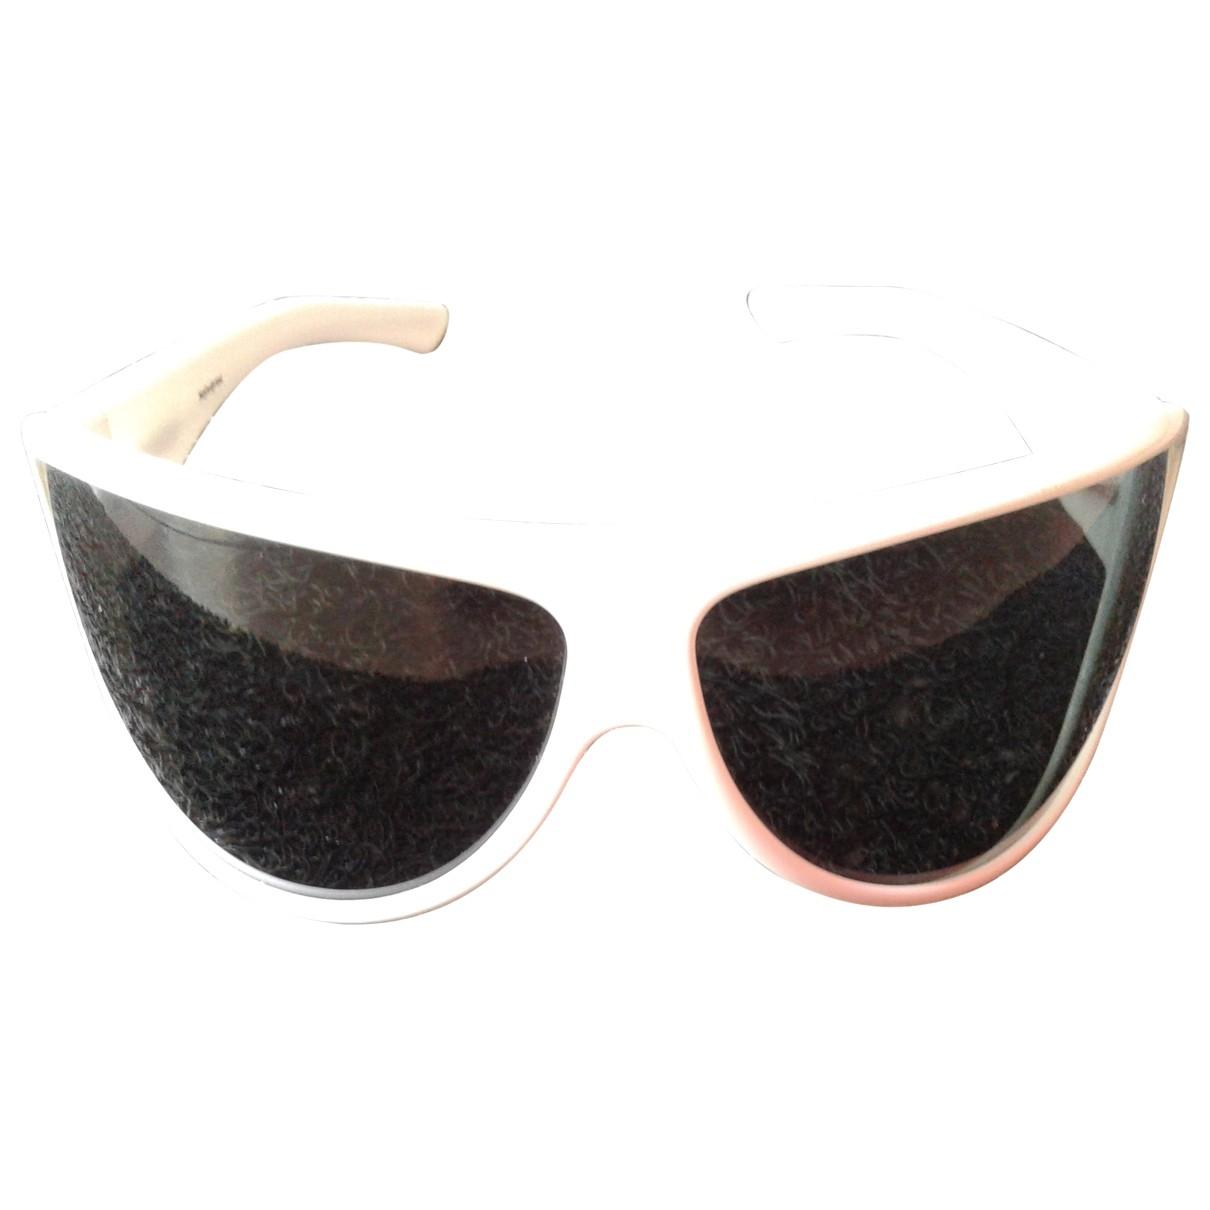 Yves Saint Laurent \N Sonnenbrillen in  Weiss Kunststoff